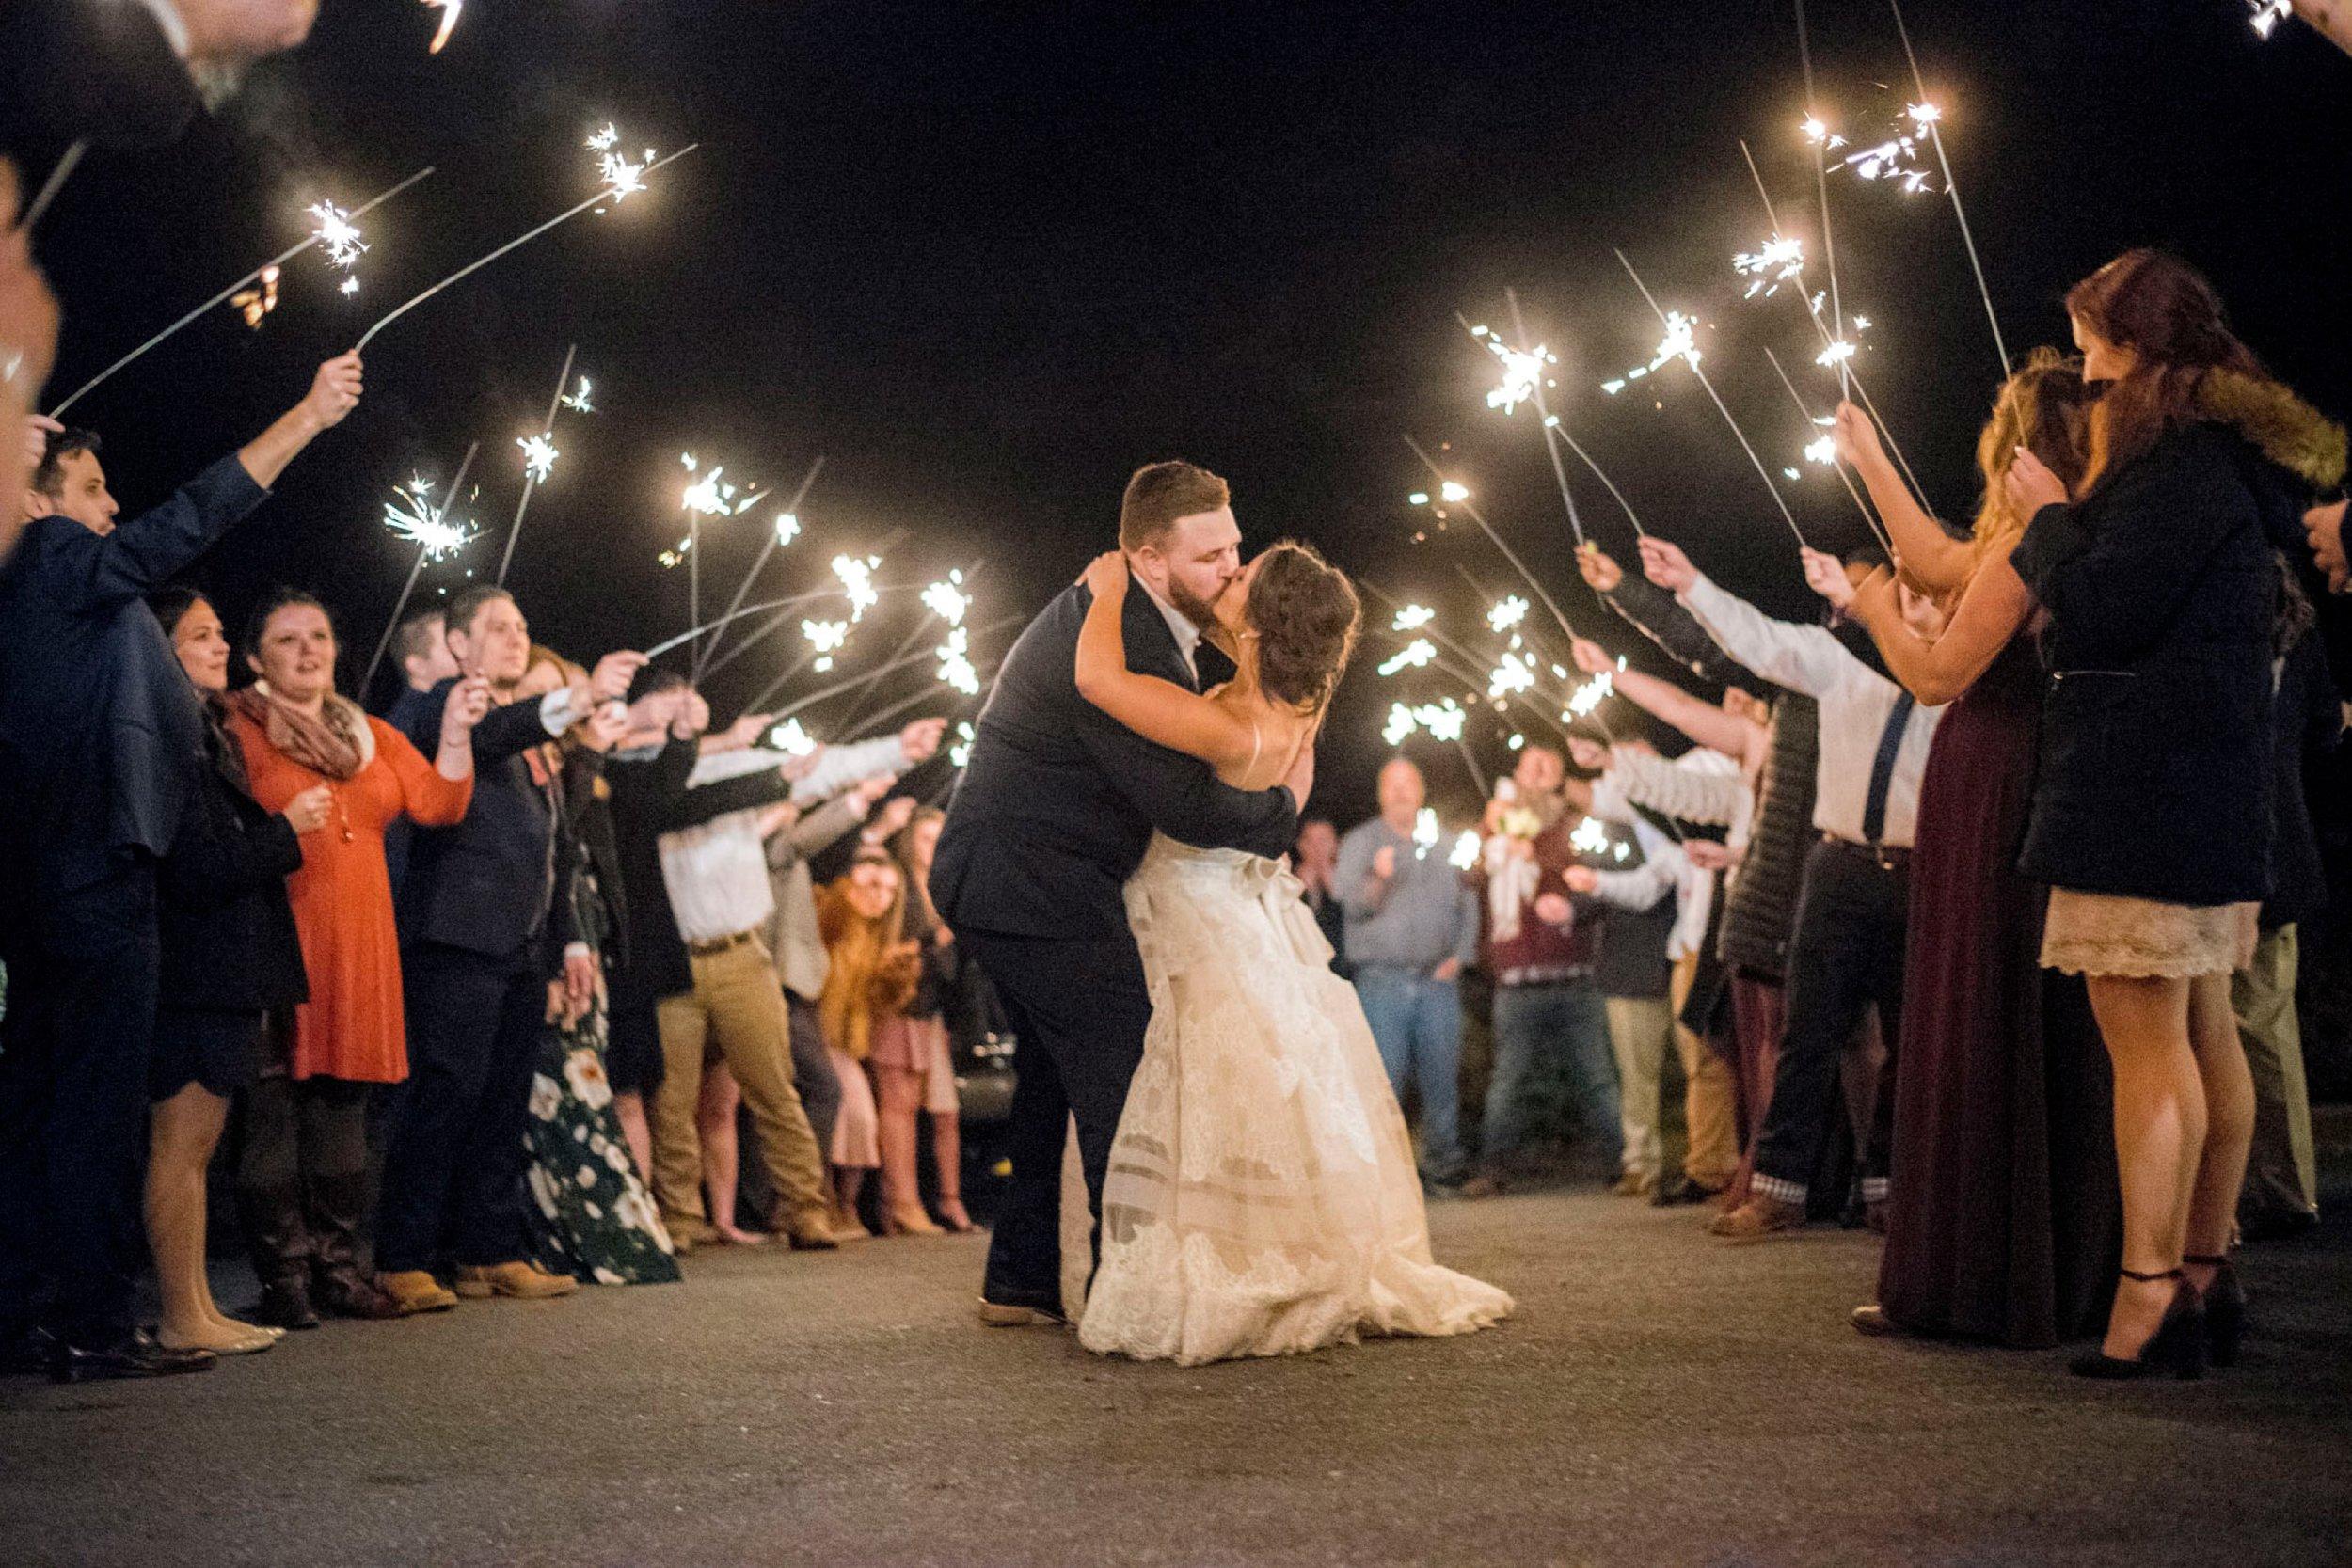 IrvineEstate_LexingtonVA_Wedding_FallWedding_VirginiaWeddingPhotographer 111.jpg